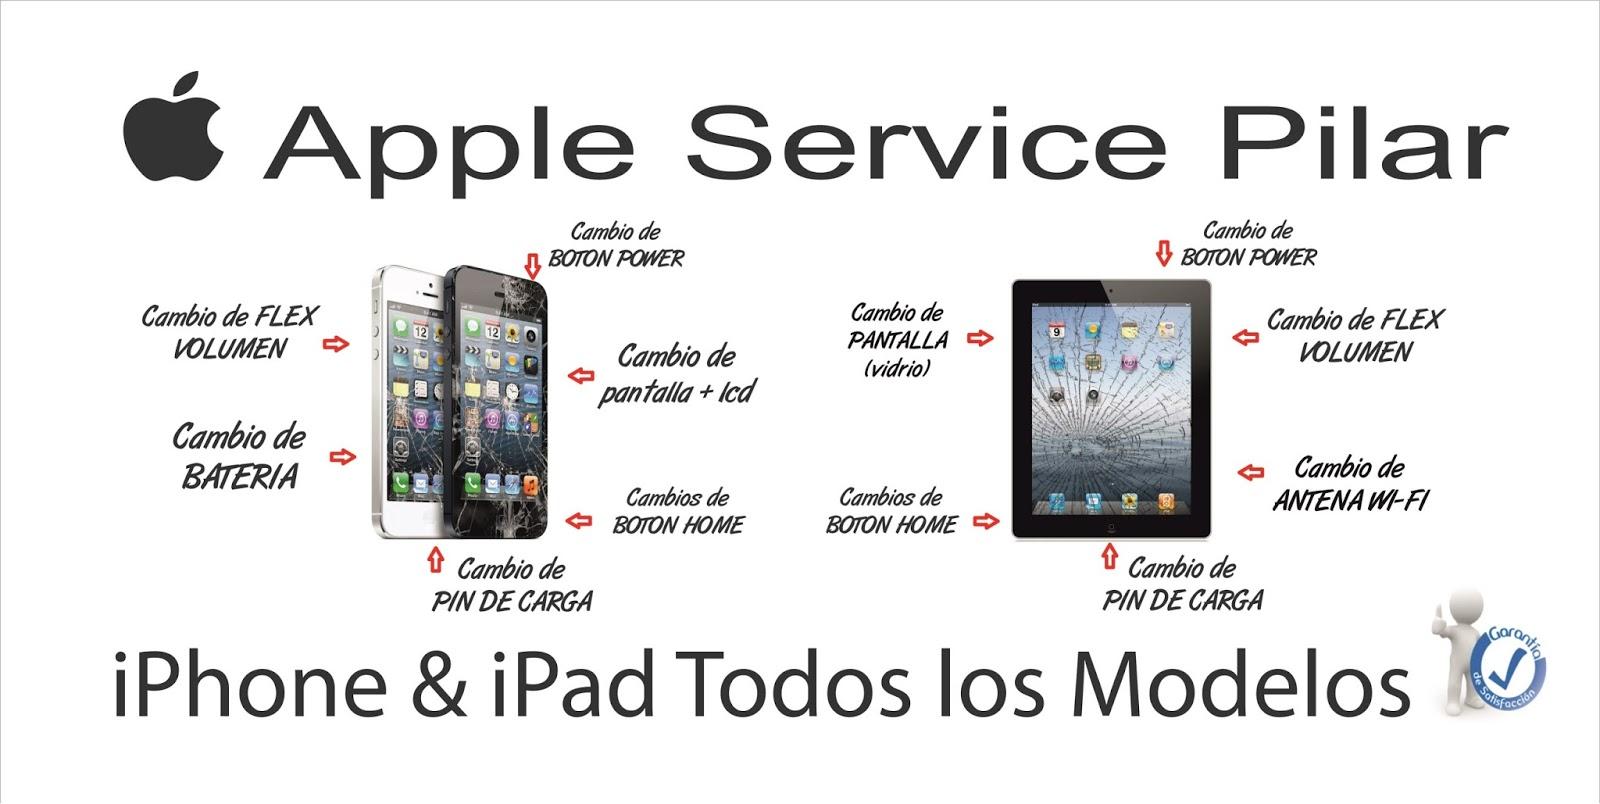 Apple Service Pilar